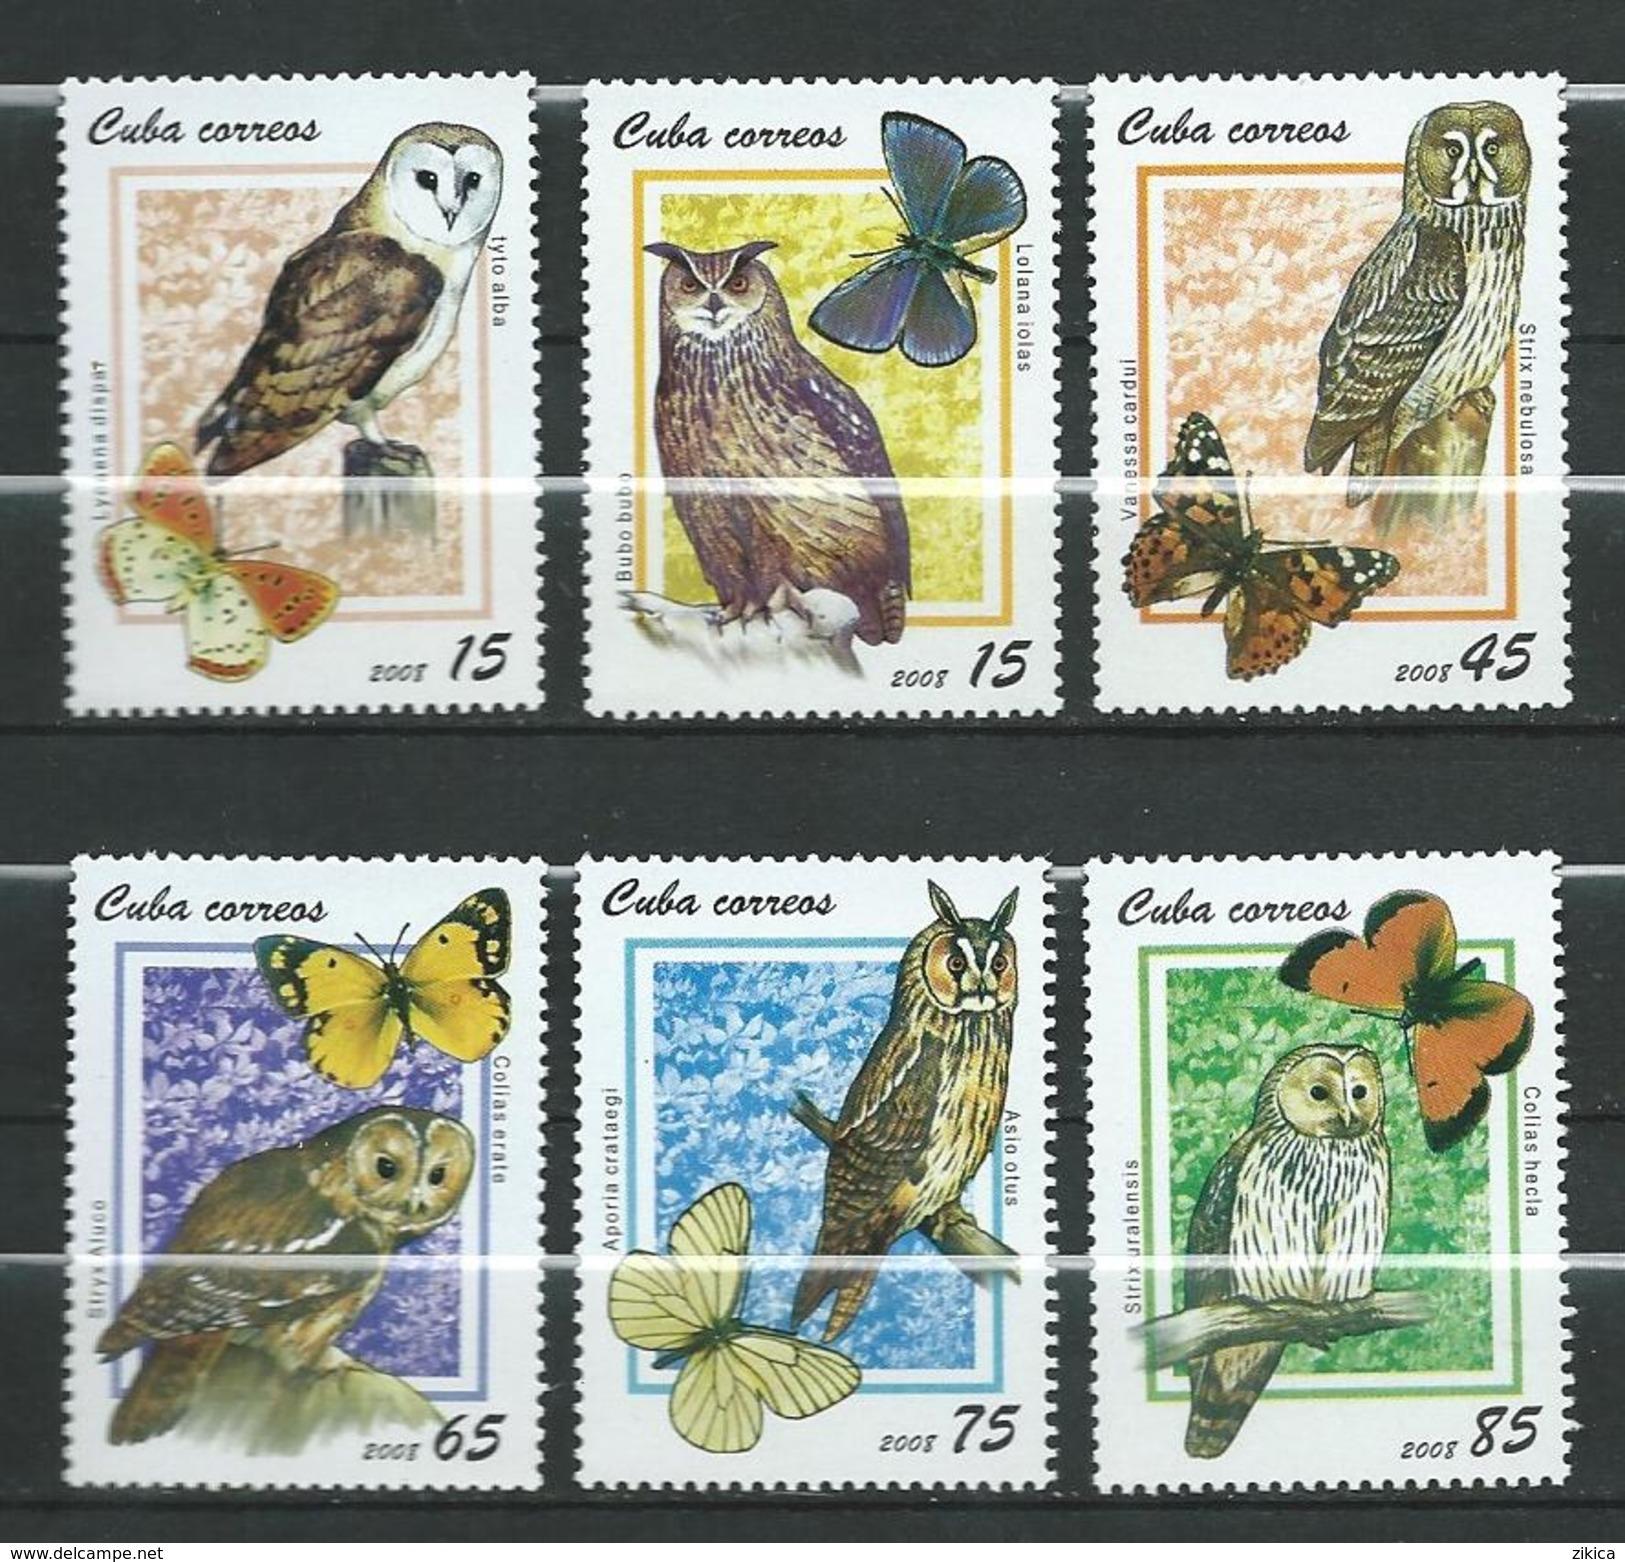 Cuba 2008.Fauna. Owl And Butterfly. Hiboux Et Le Papillon.2008 International Stamp Exhibition - EFIRO 2008.MNH - Nuovi